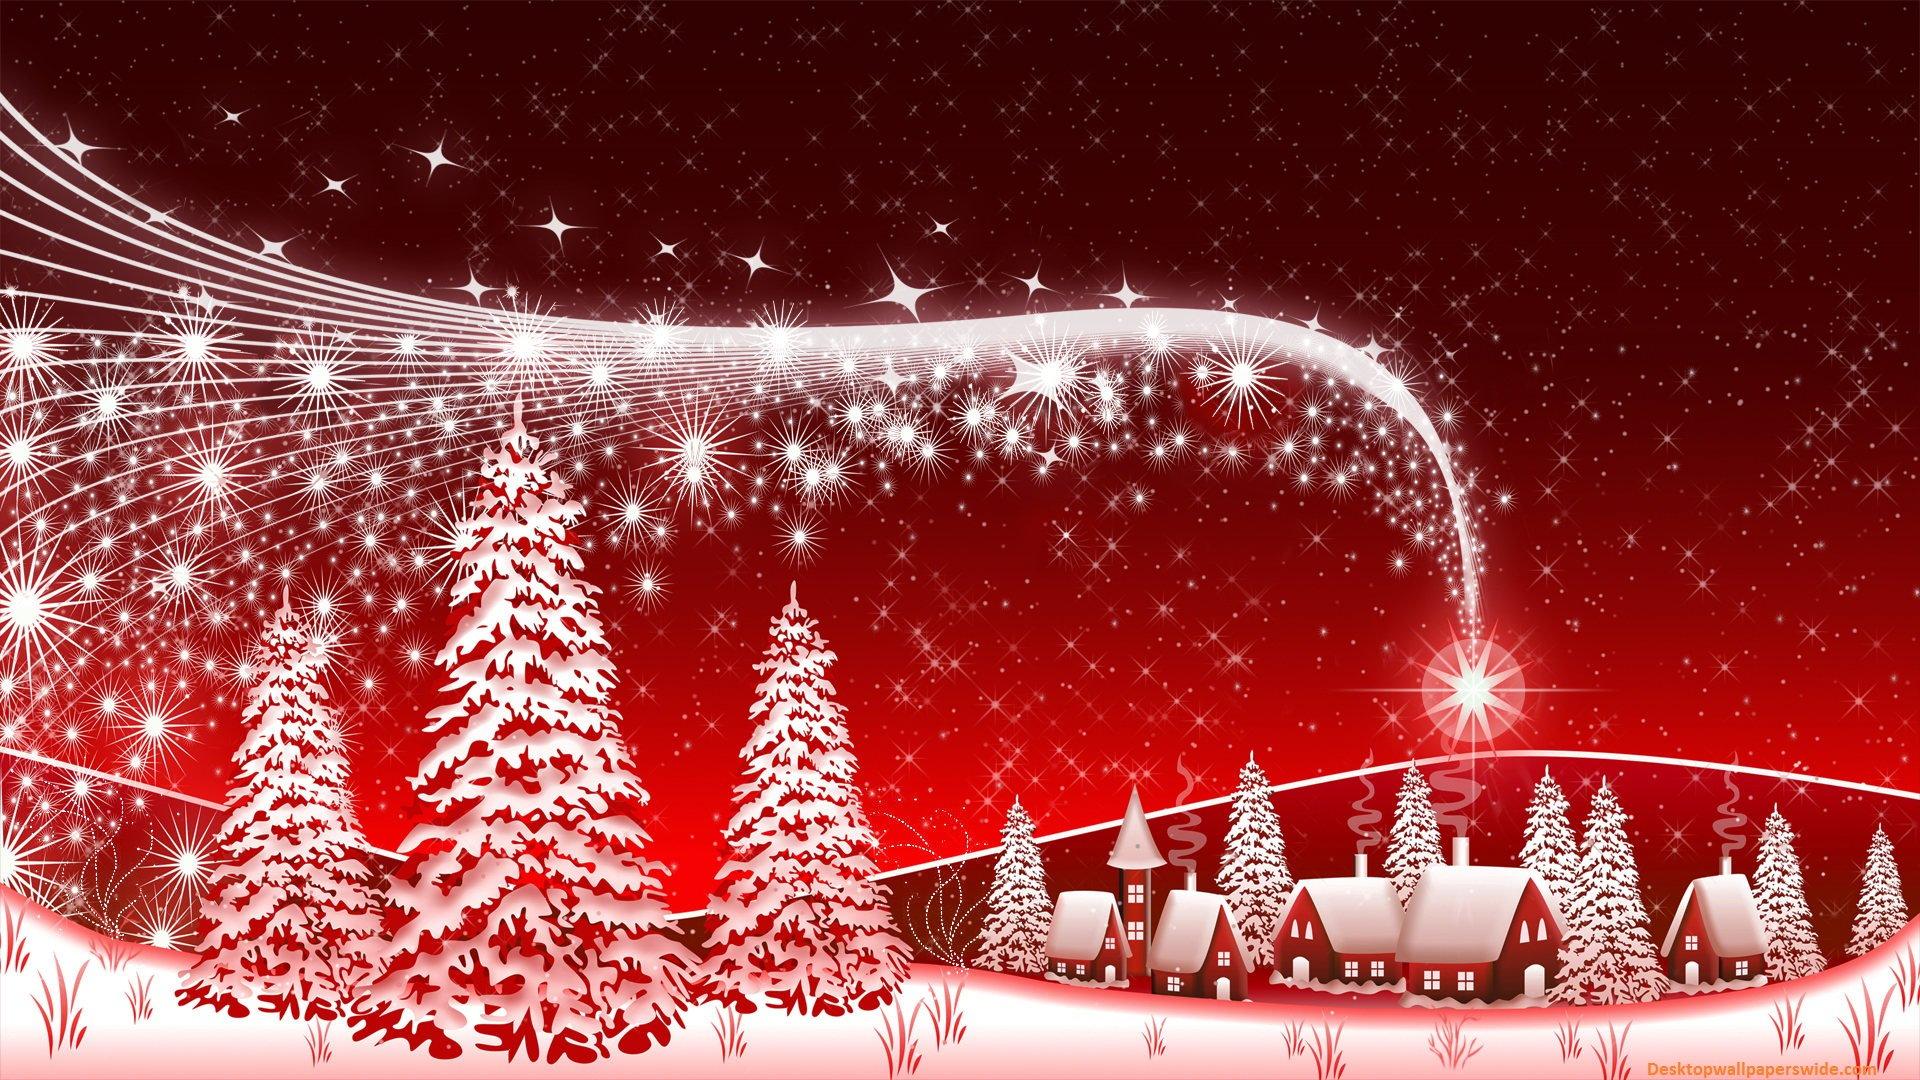 Christmas Wallpapers Hd Christmas Hd Wallpapers Widescreen 1920x1080